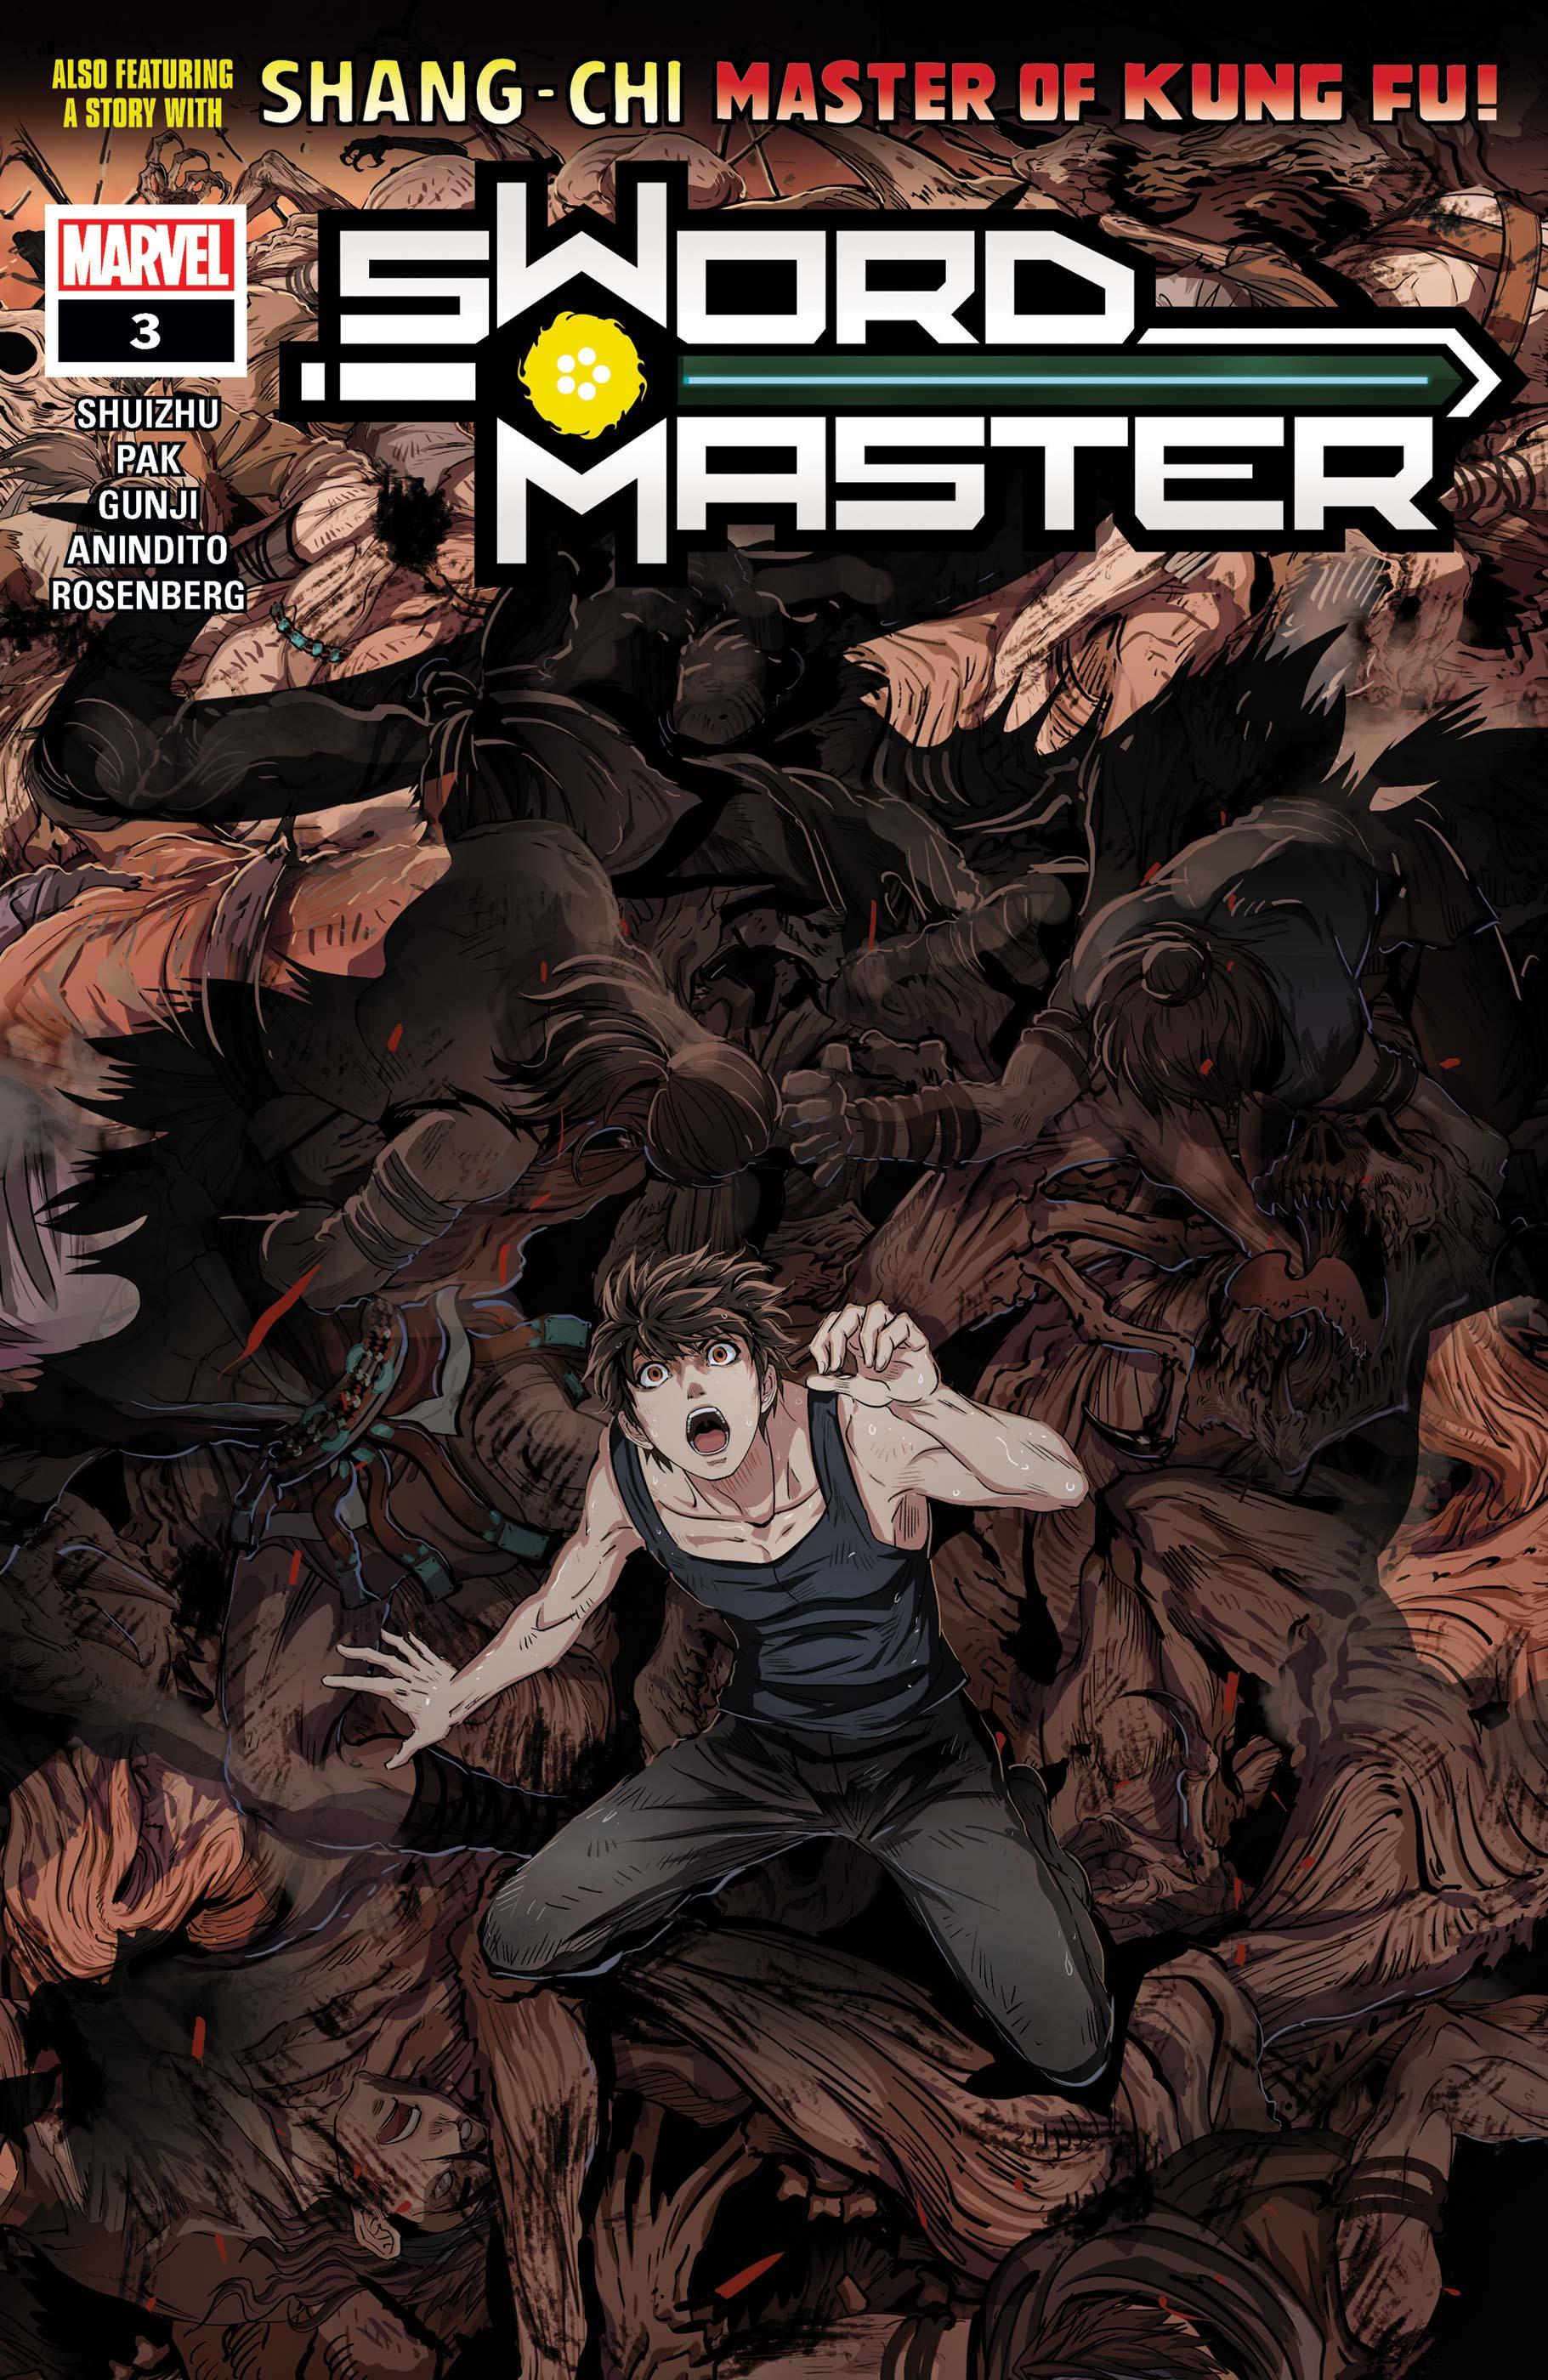 Sword Master (2019) #3